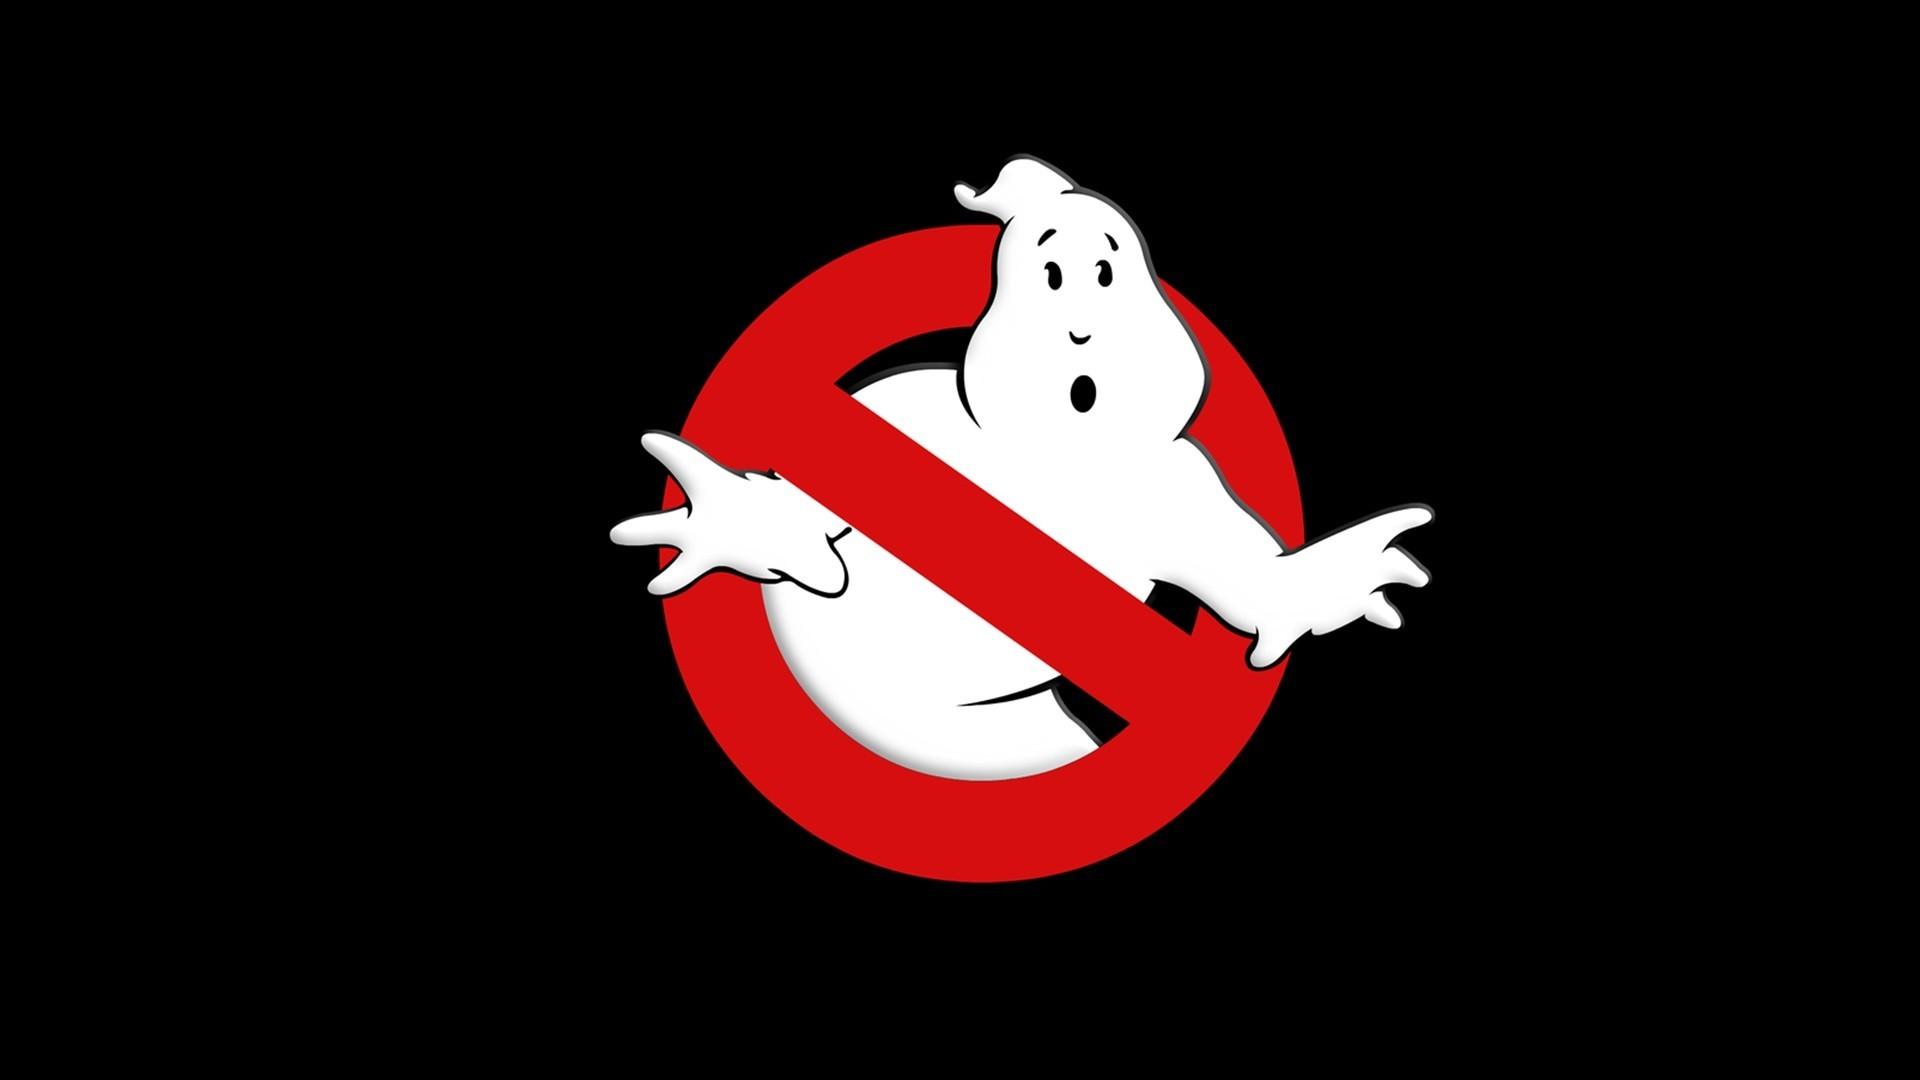 Ghostbusters 3 Wallpaper Ghostbusters 2016, HD ...